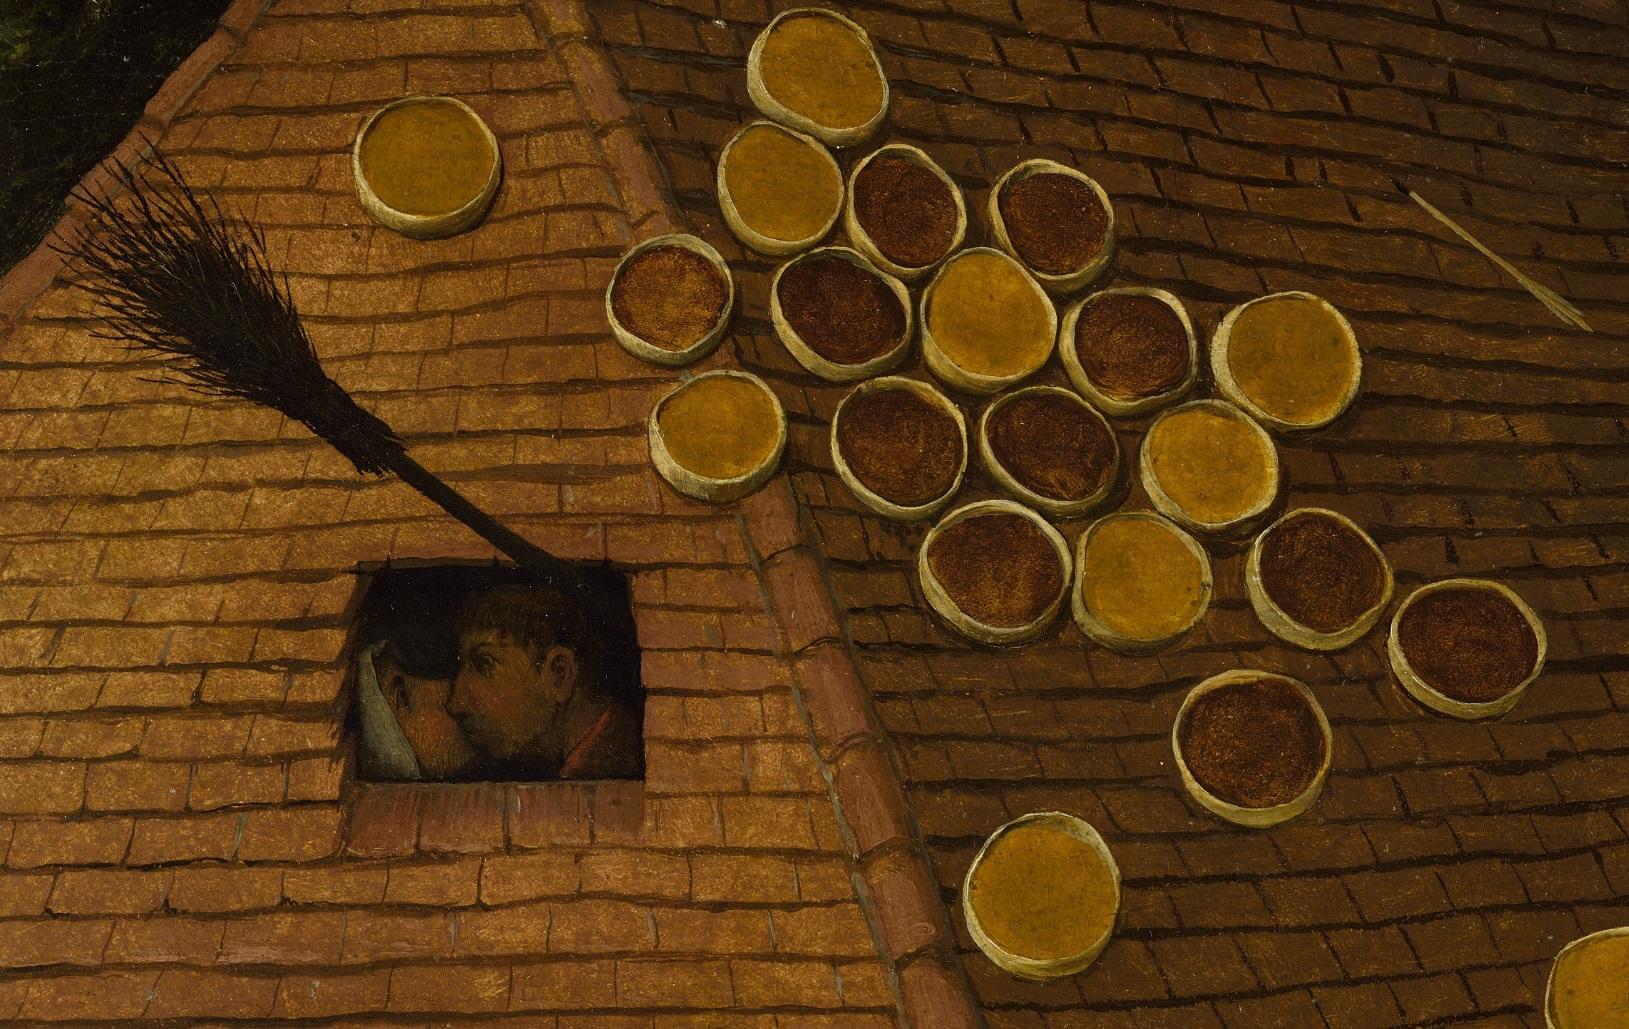 brueghel-proverbs-011.jpg